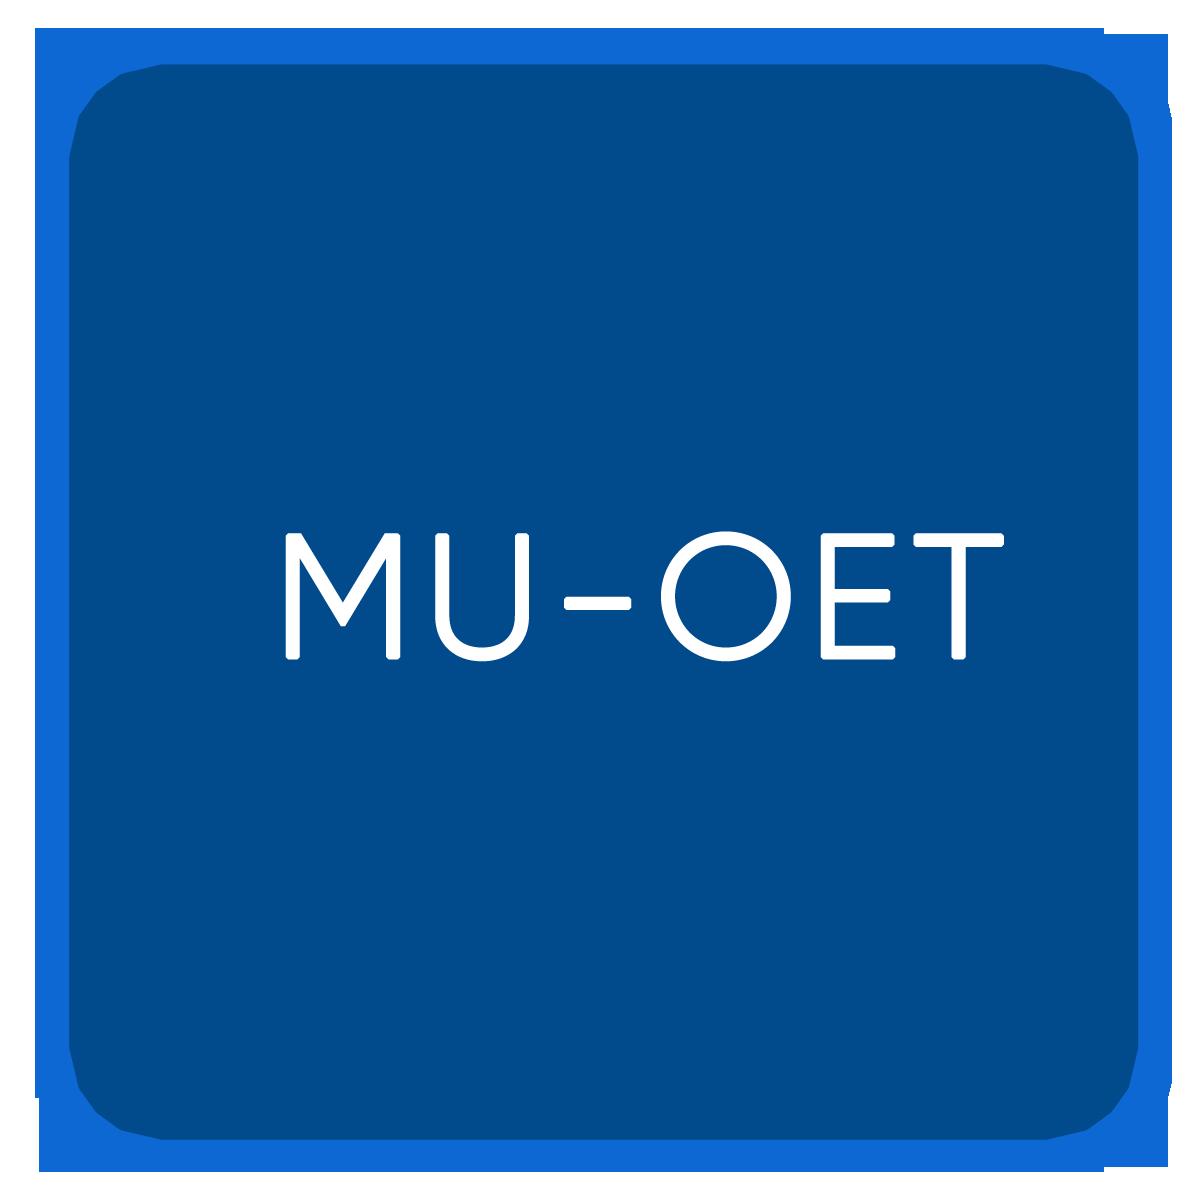 MU-OET